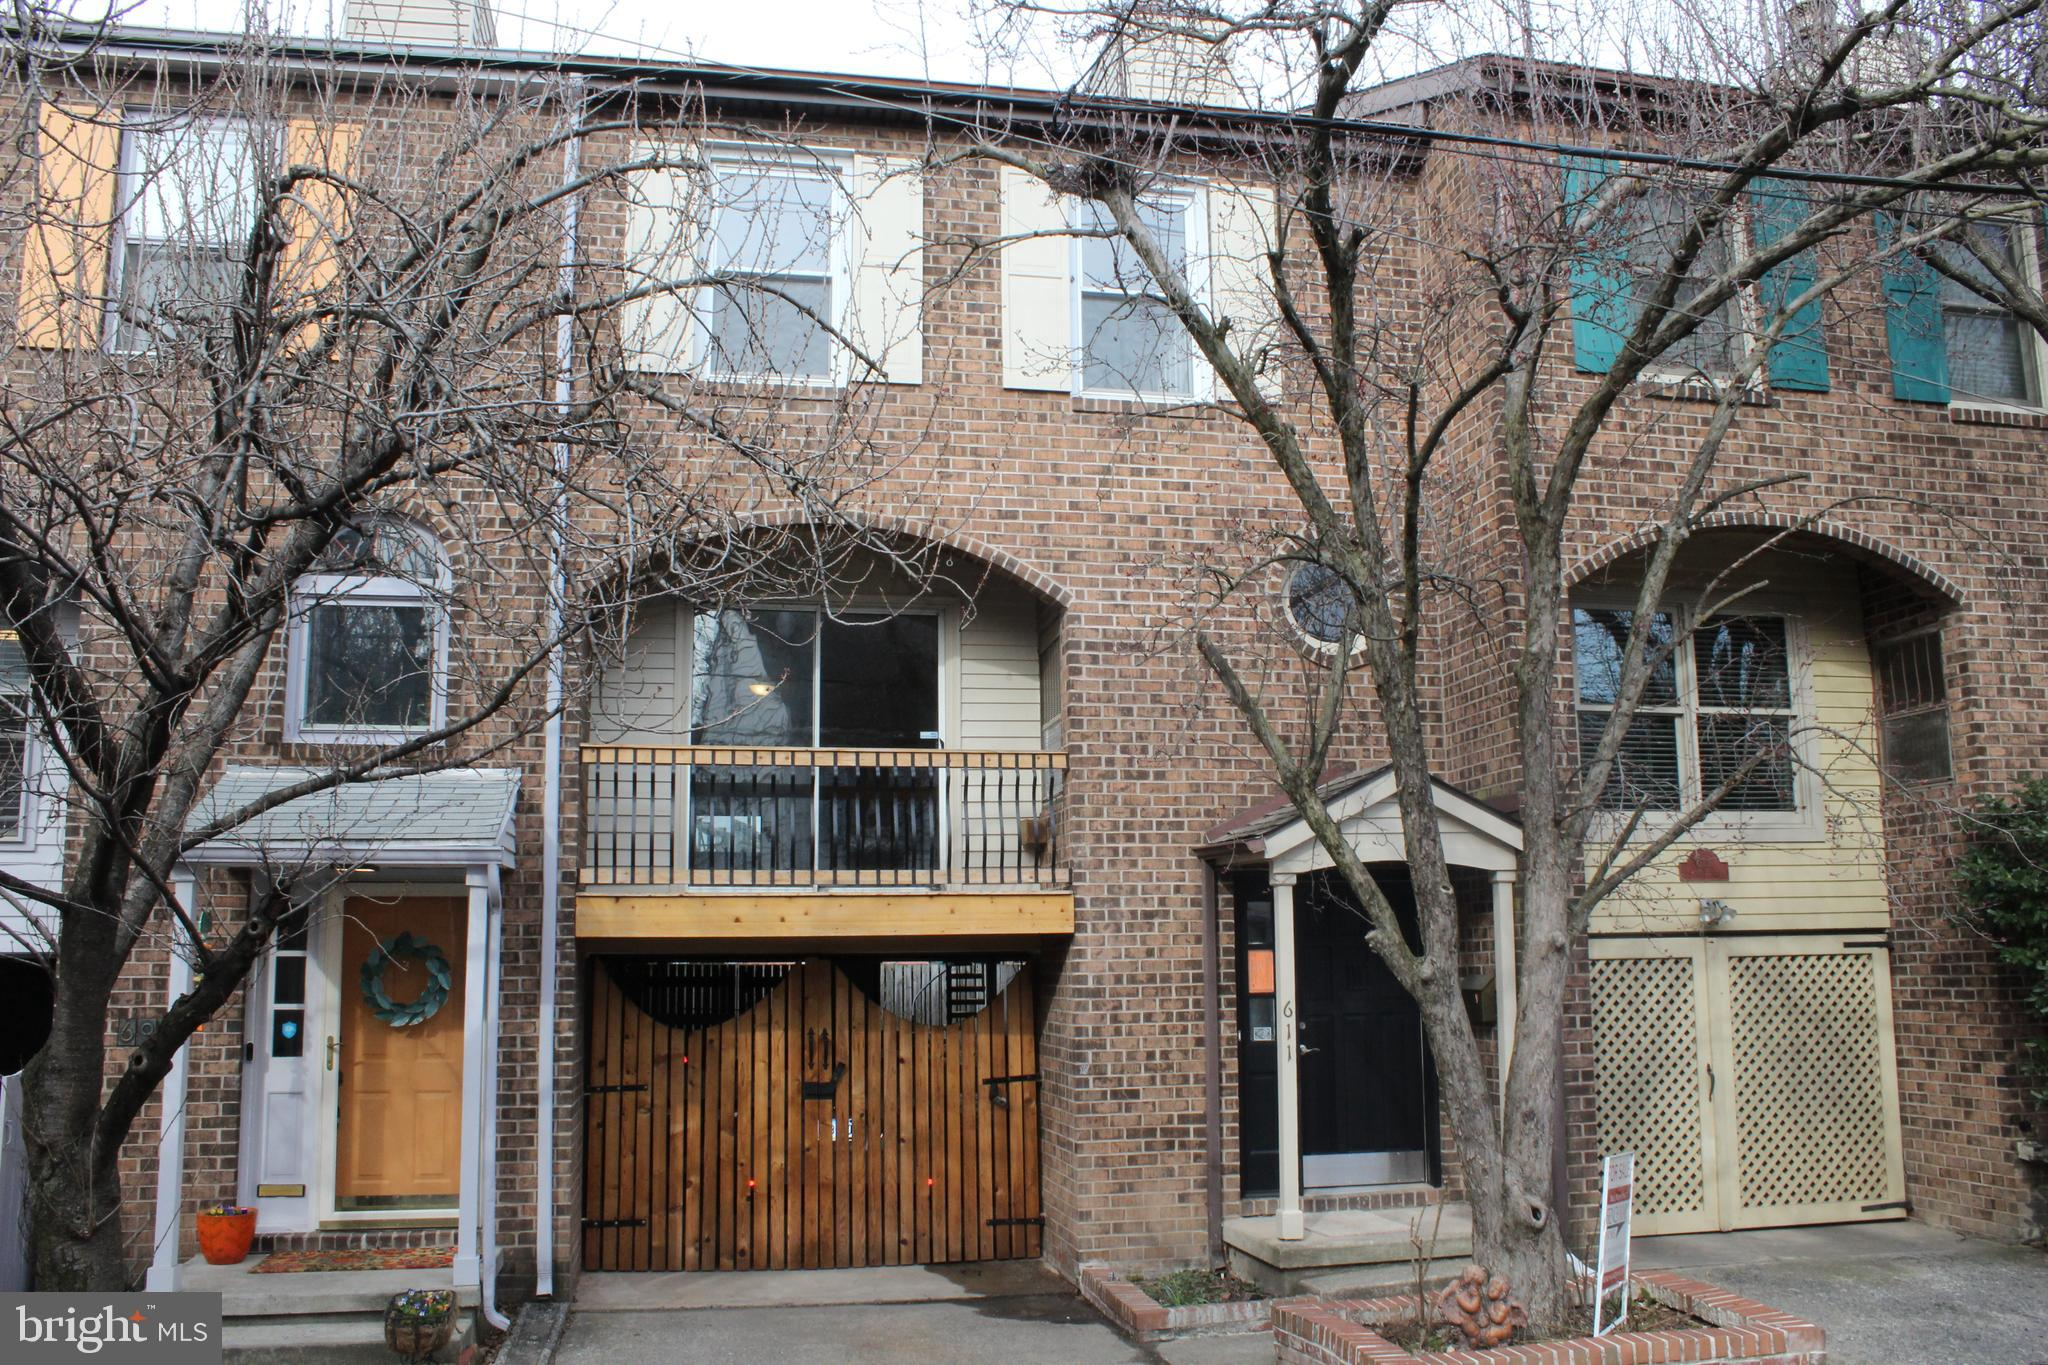 611 SHOWERS STREET, HARRISBURG, PA 17104